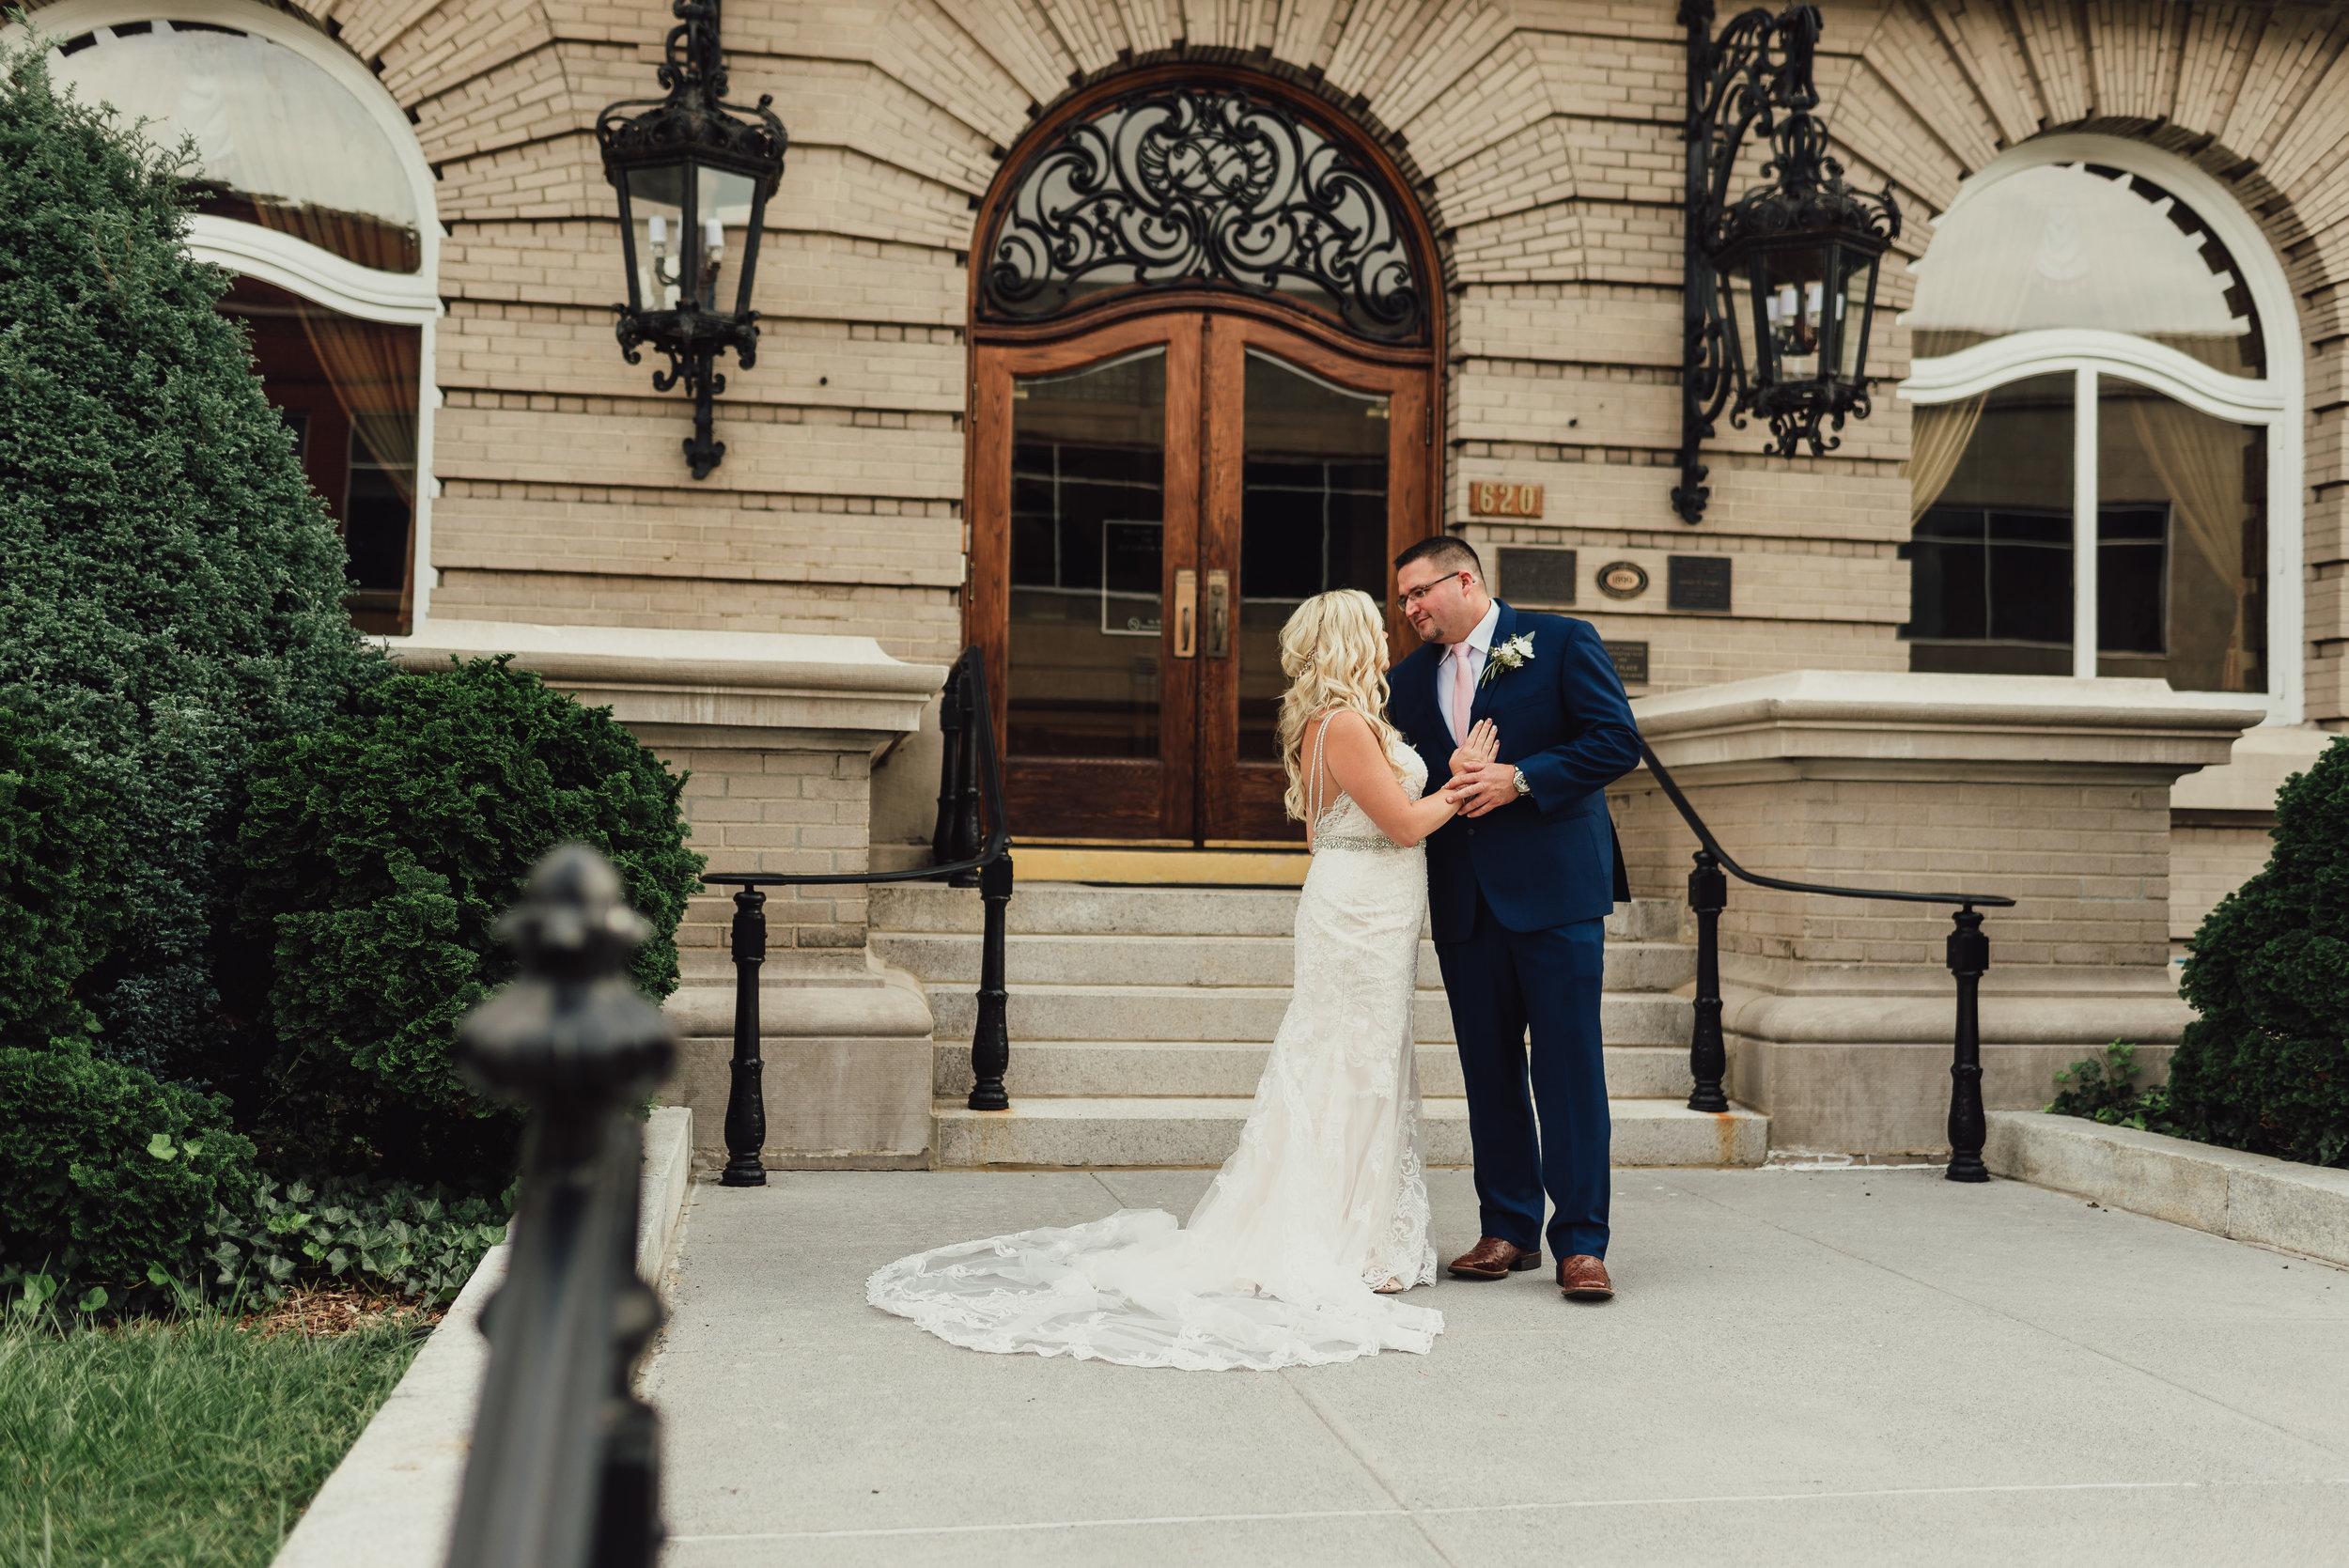 east-tn-wedding-photographer-tennessee-elopement-photographer-kingsport-tn-wedding-photographer (251 of 1001).jpg